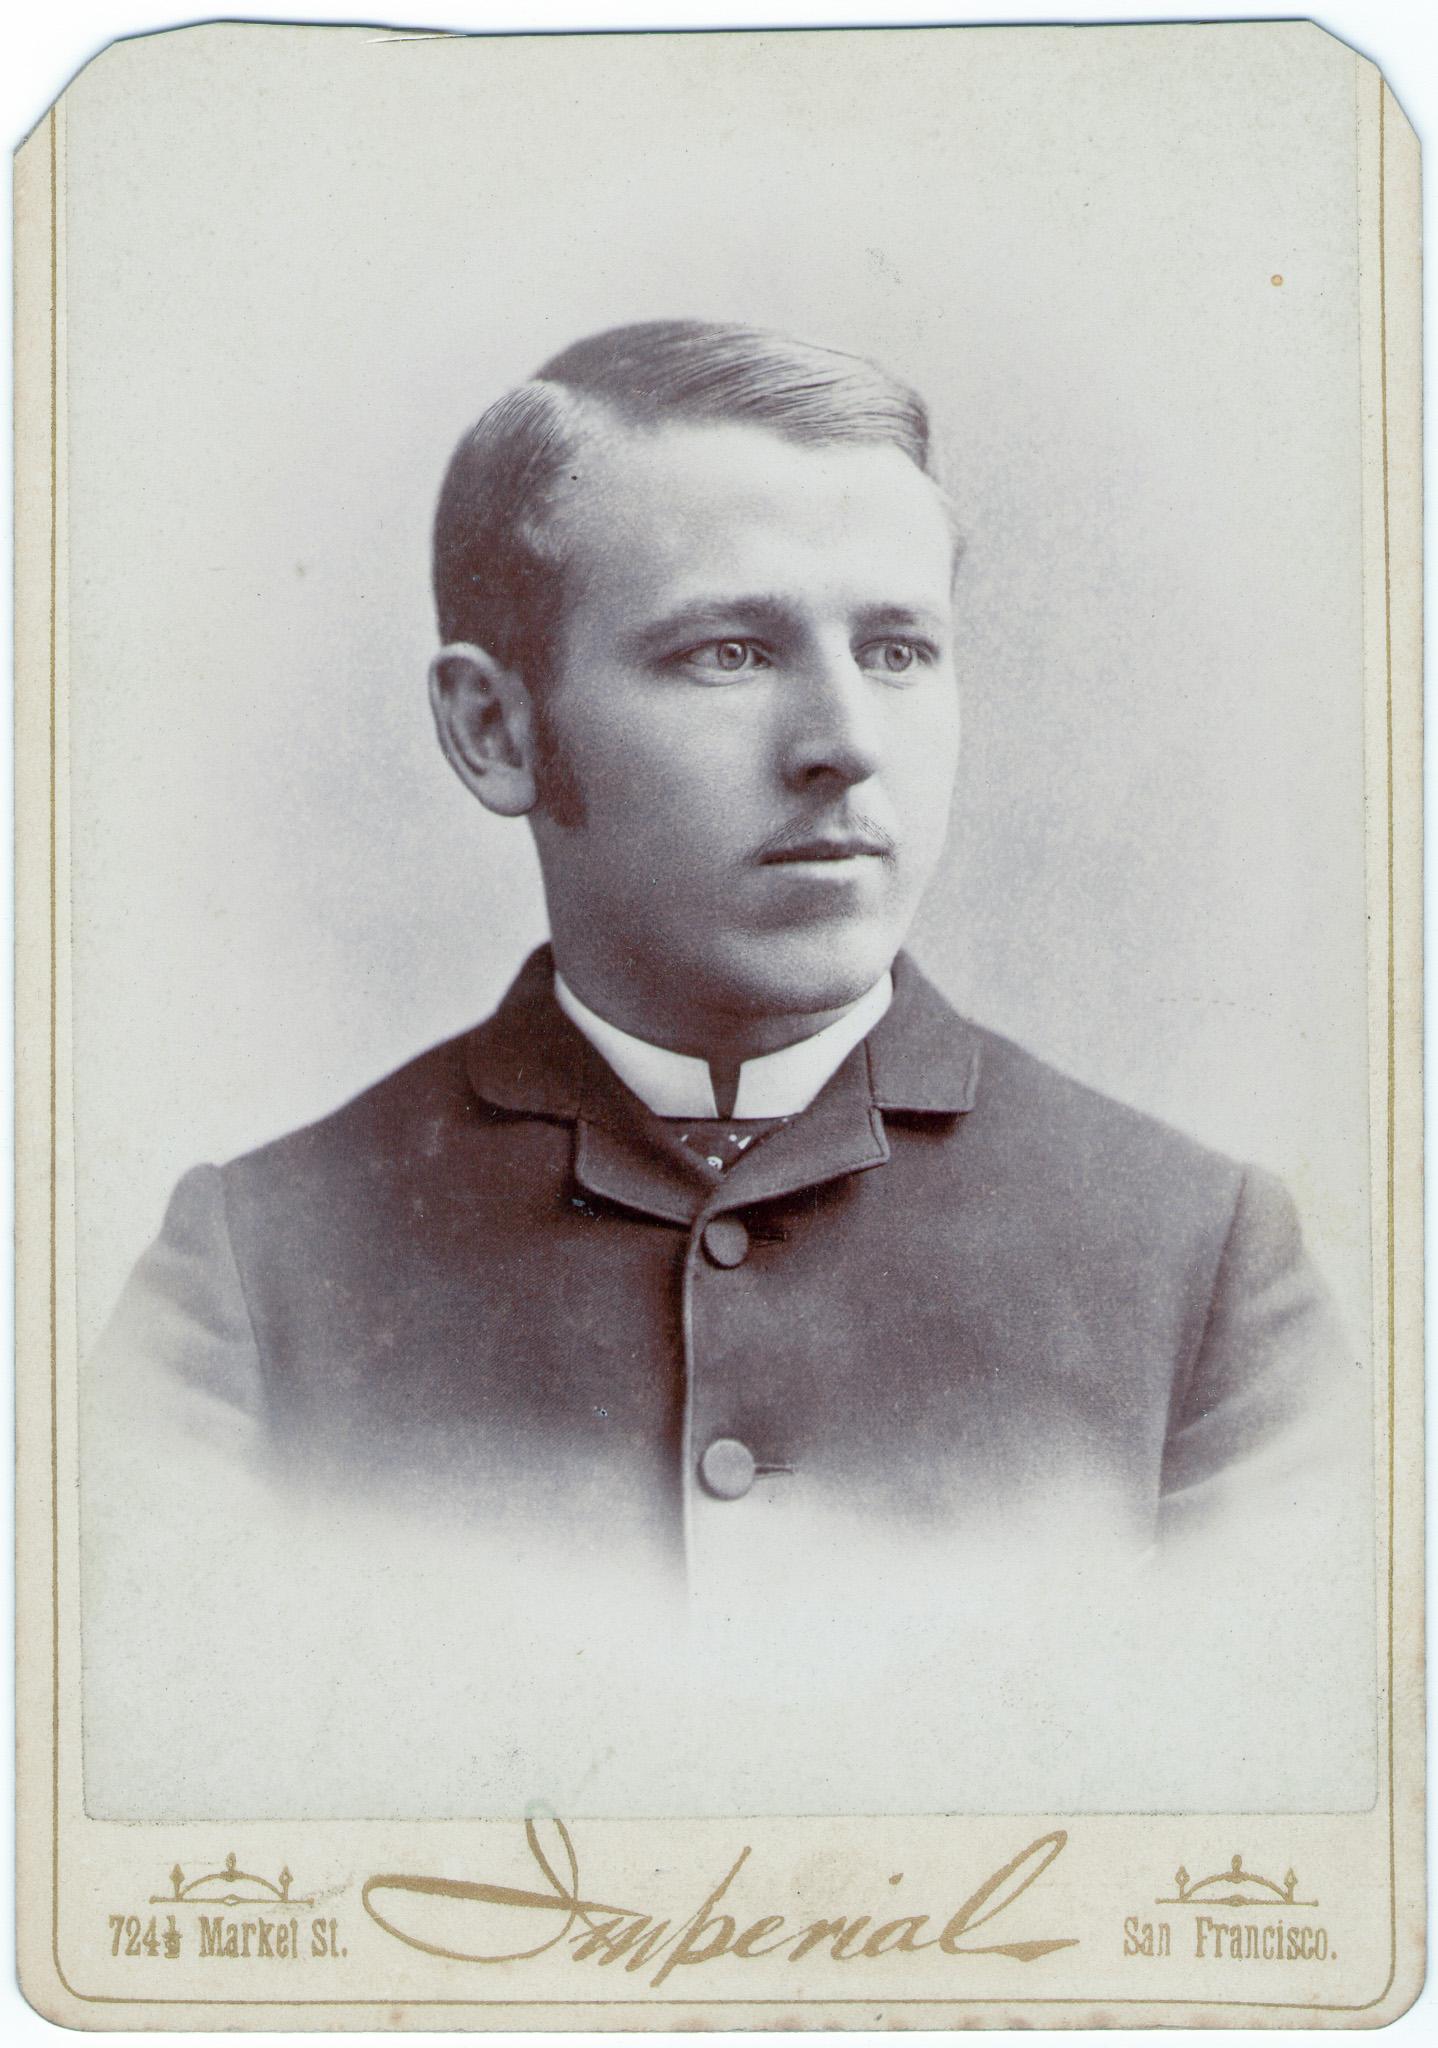 William J Davis